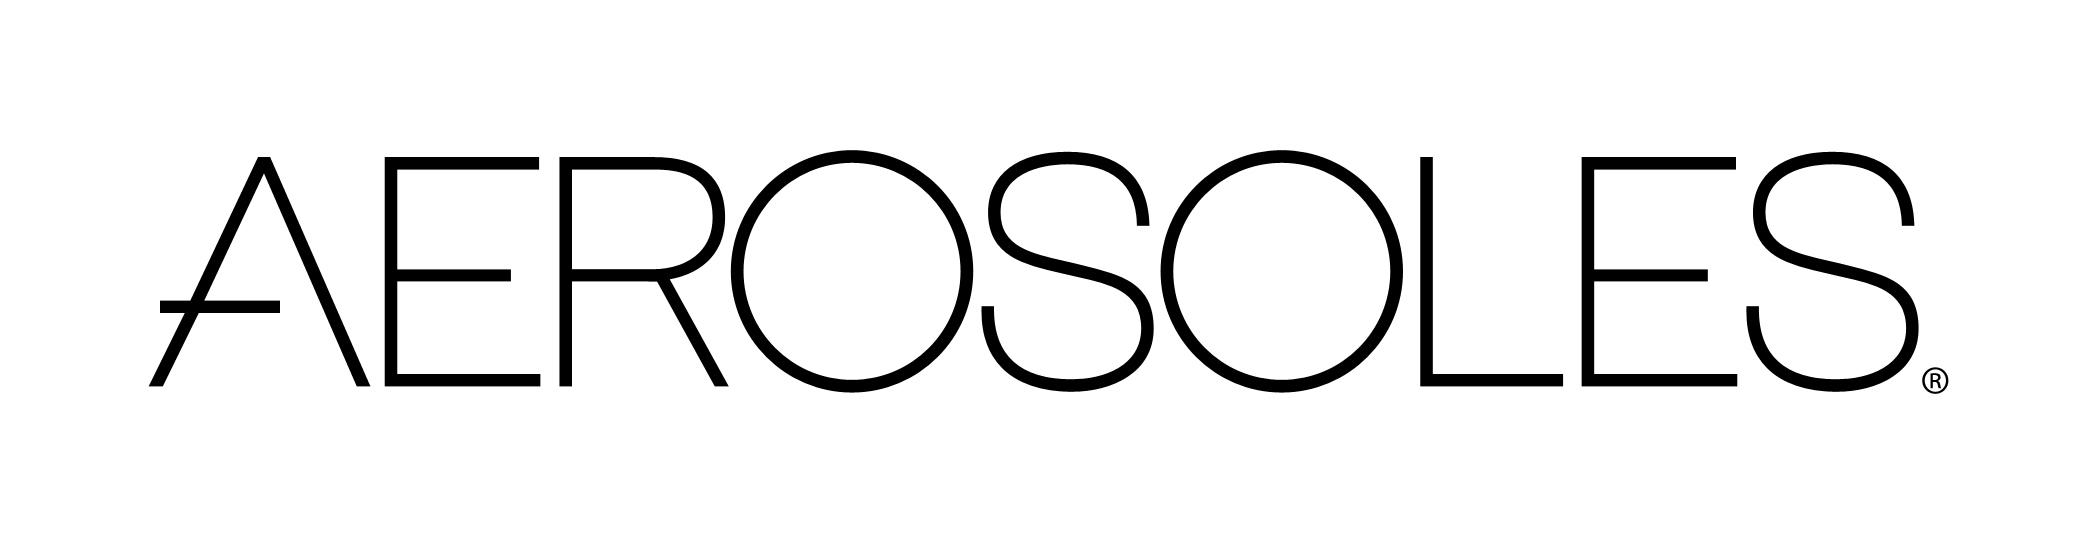 Aerosoles_Logo_bl_st